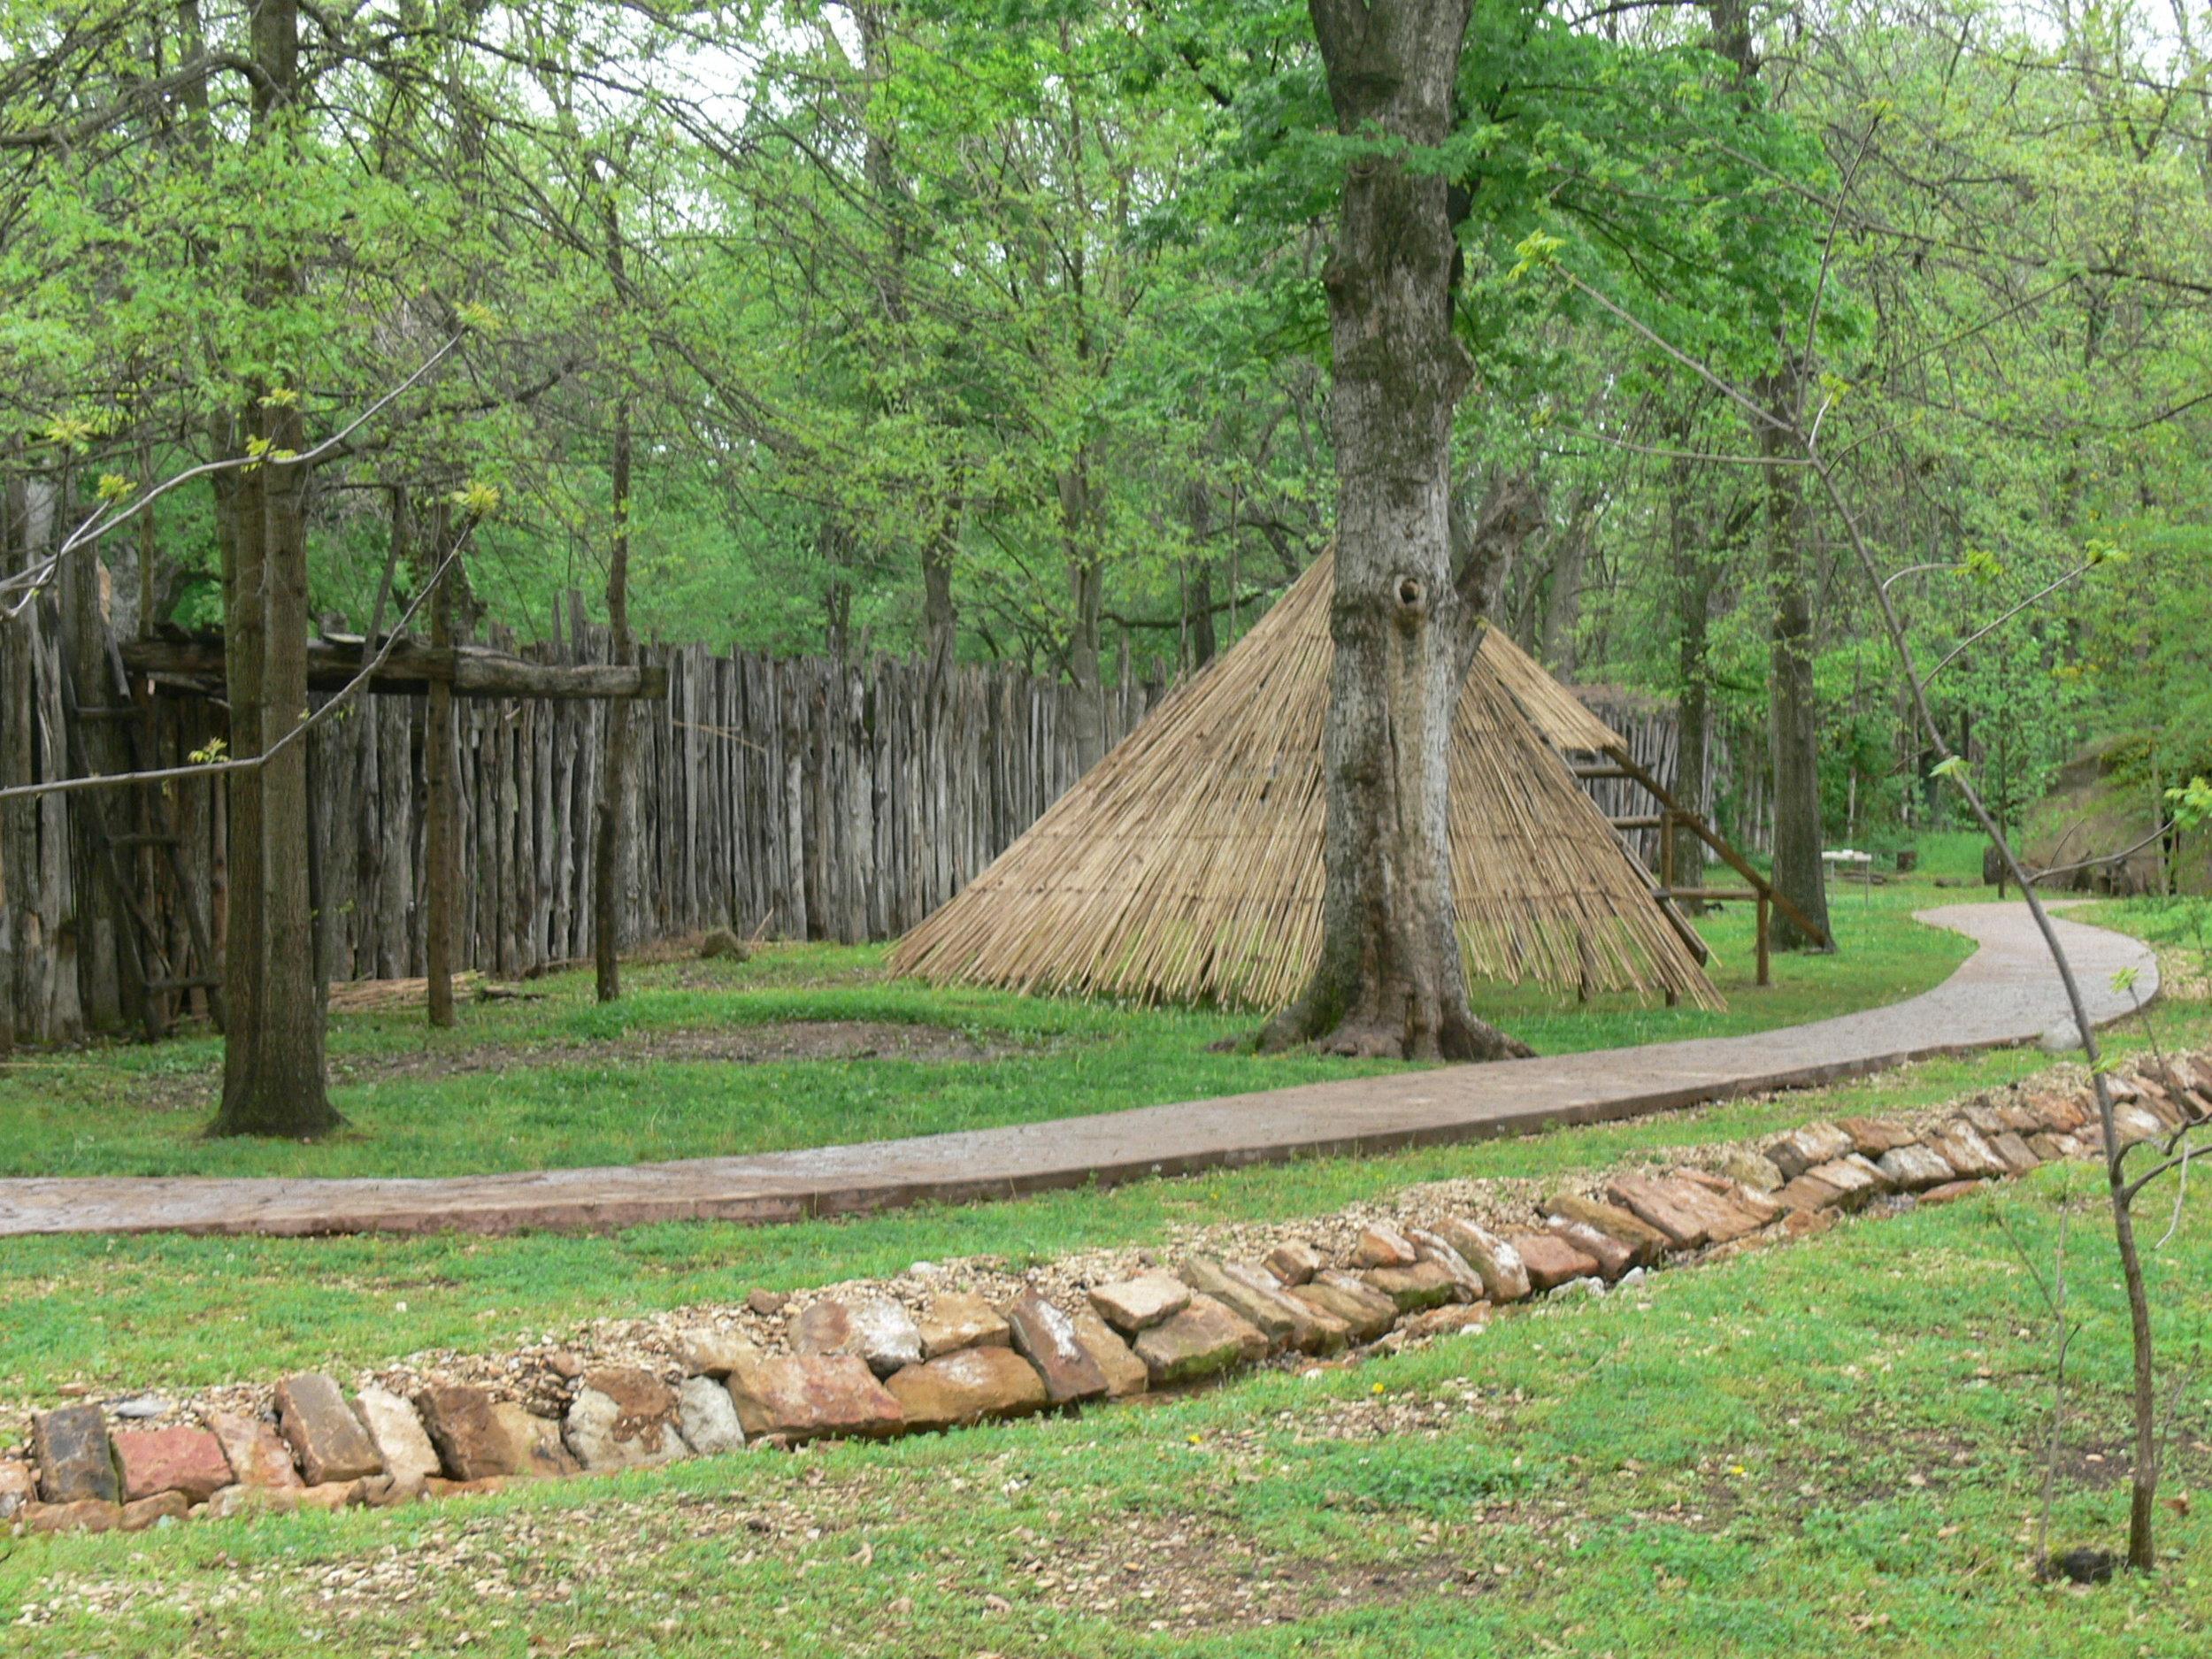 cherokee nation 5.jpg